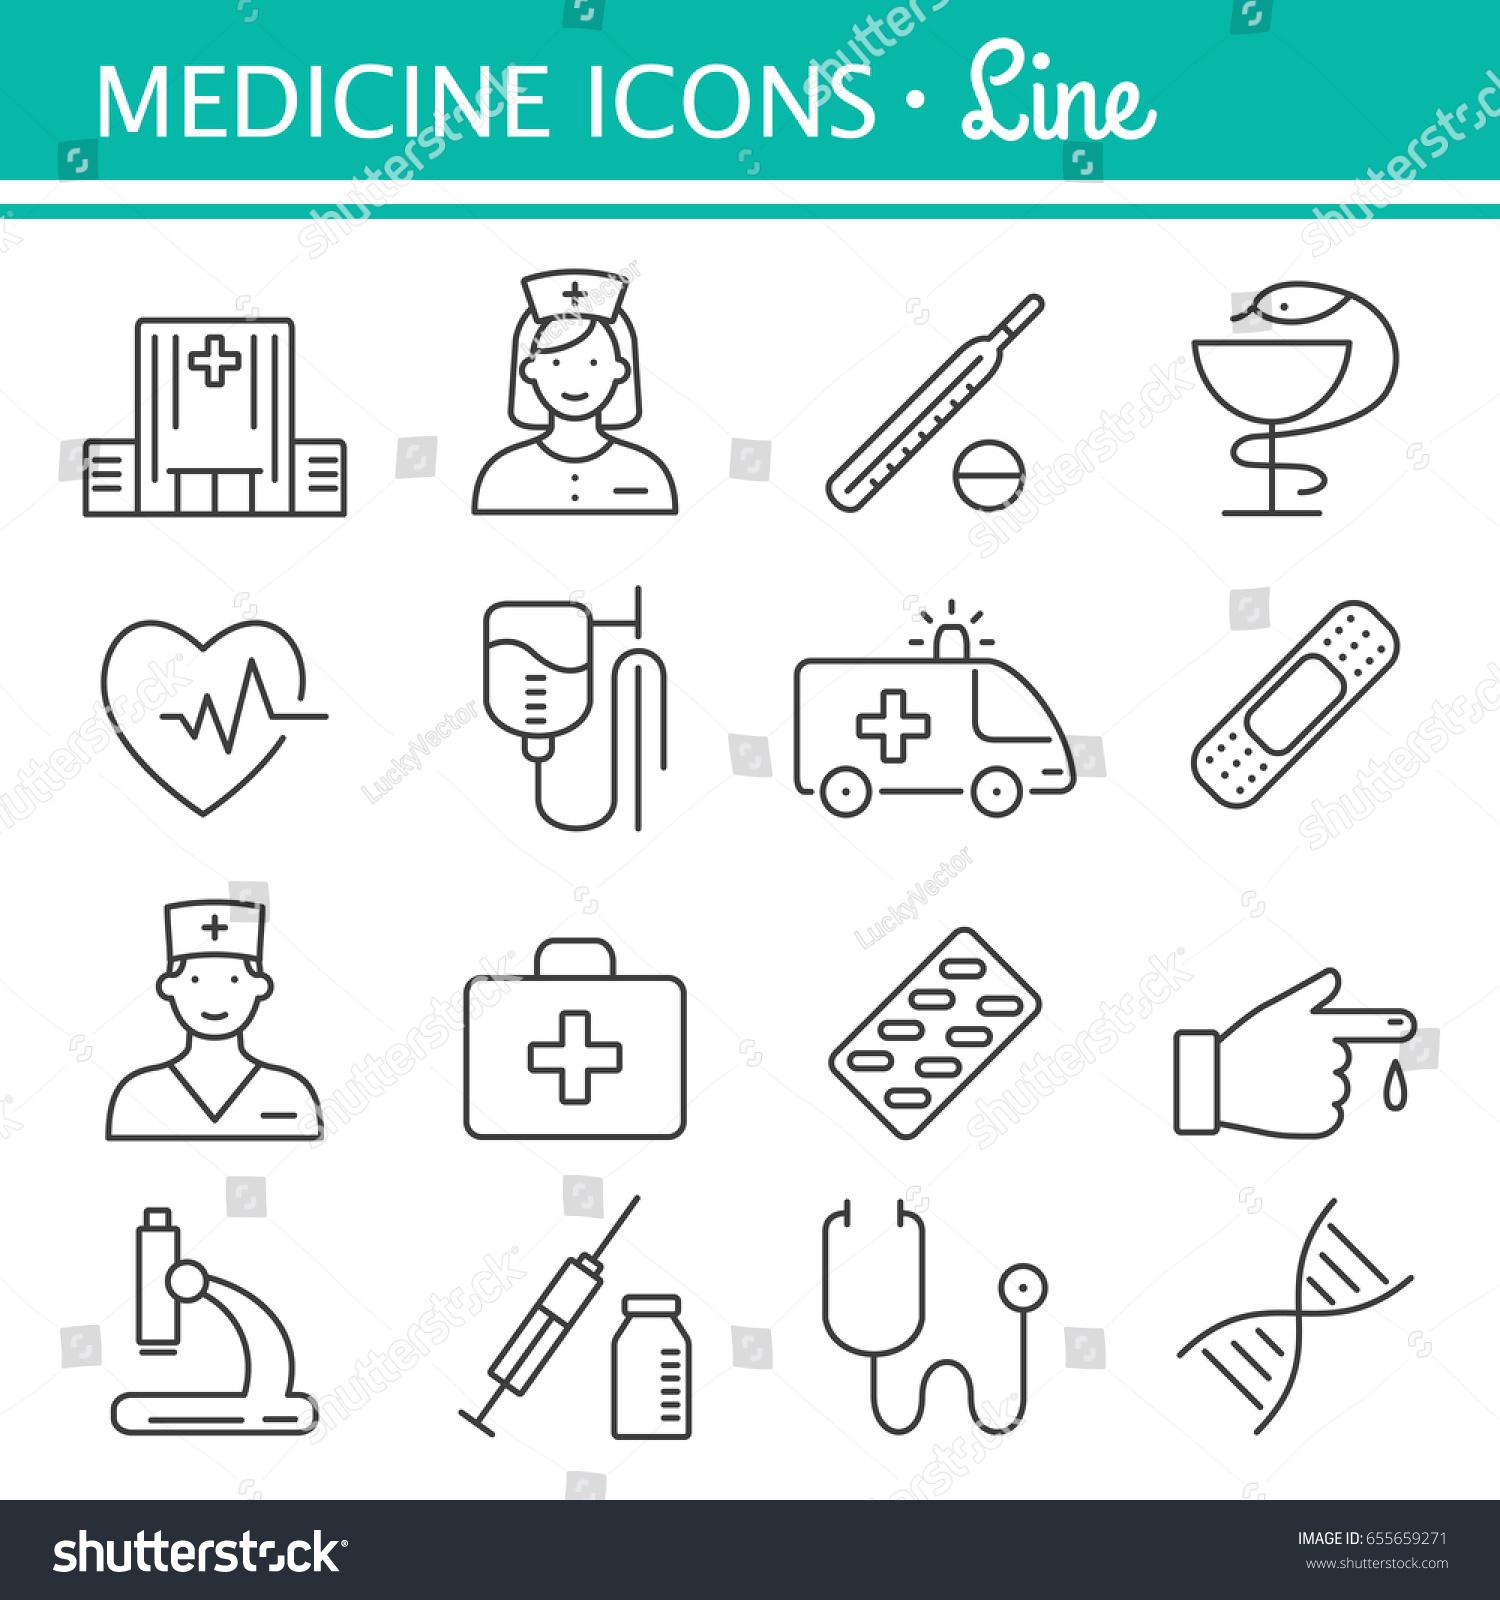 Medicine health symbols info graphics websites stock vector medicine and health symbols for info graphics websites and print media contour simple medical buycottarizona Choice Image